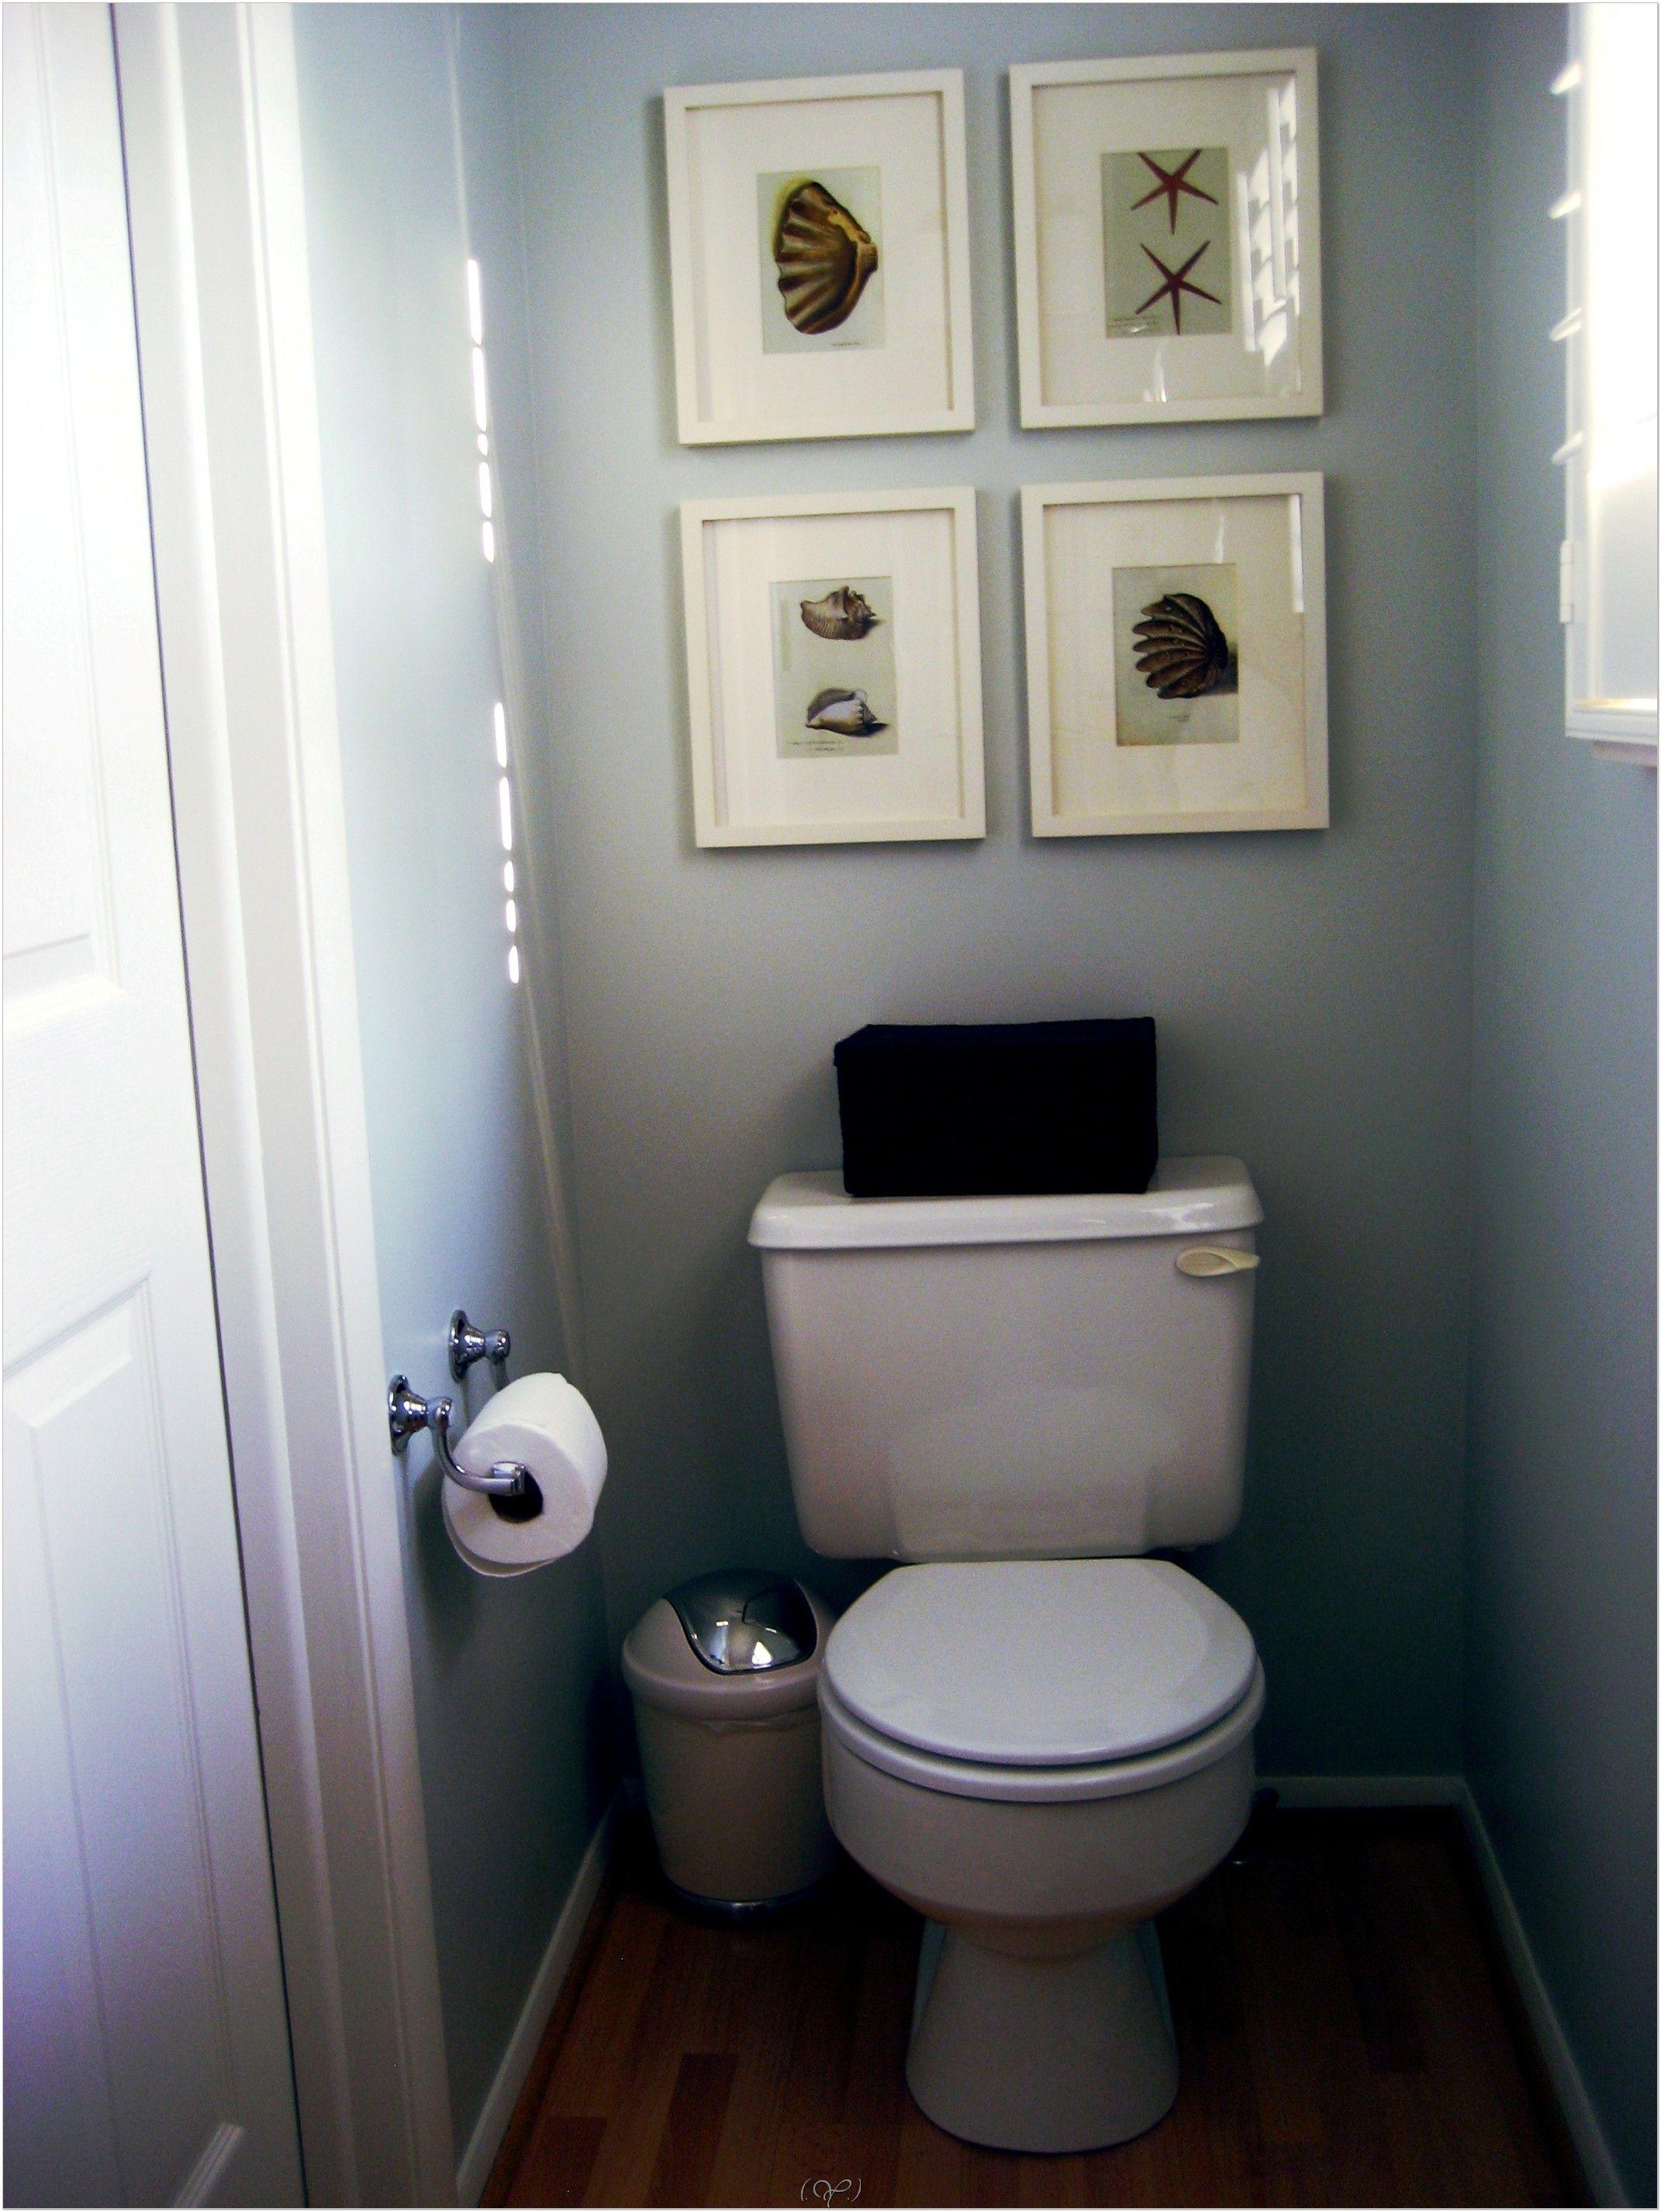 bathroom design how to make narrow half bathroom seem bigger stunning half bath designs photo ideas - Half Bathroom Decorating Ideas For Small Bathrooms